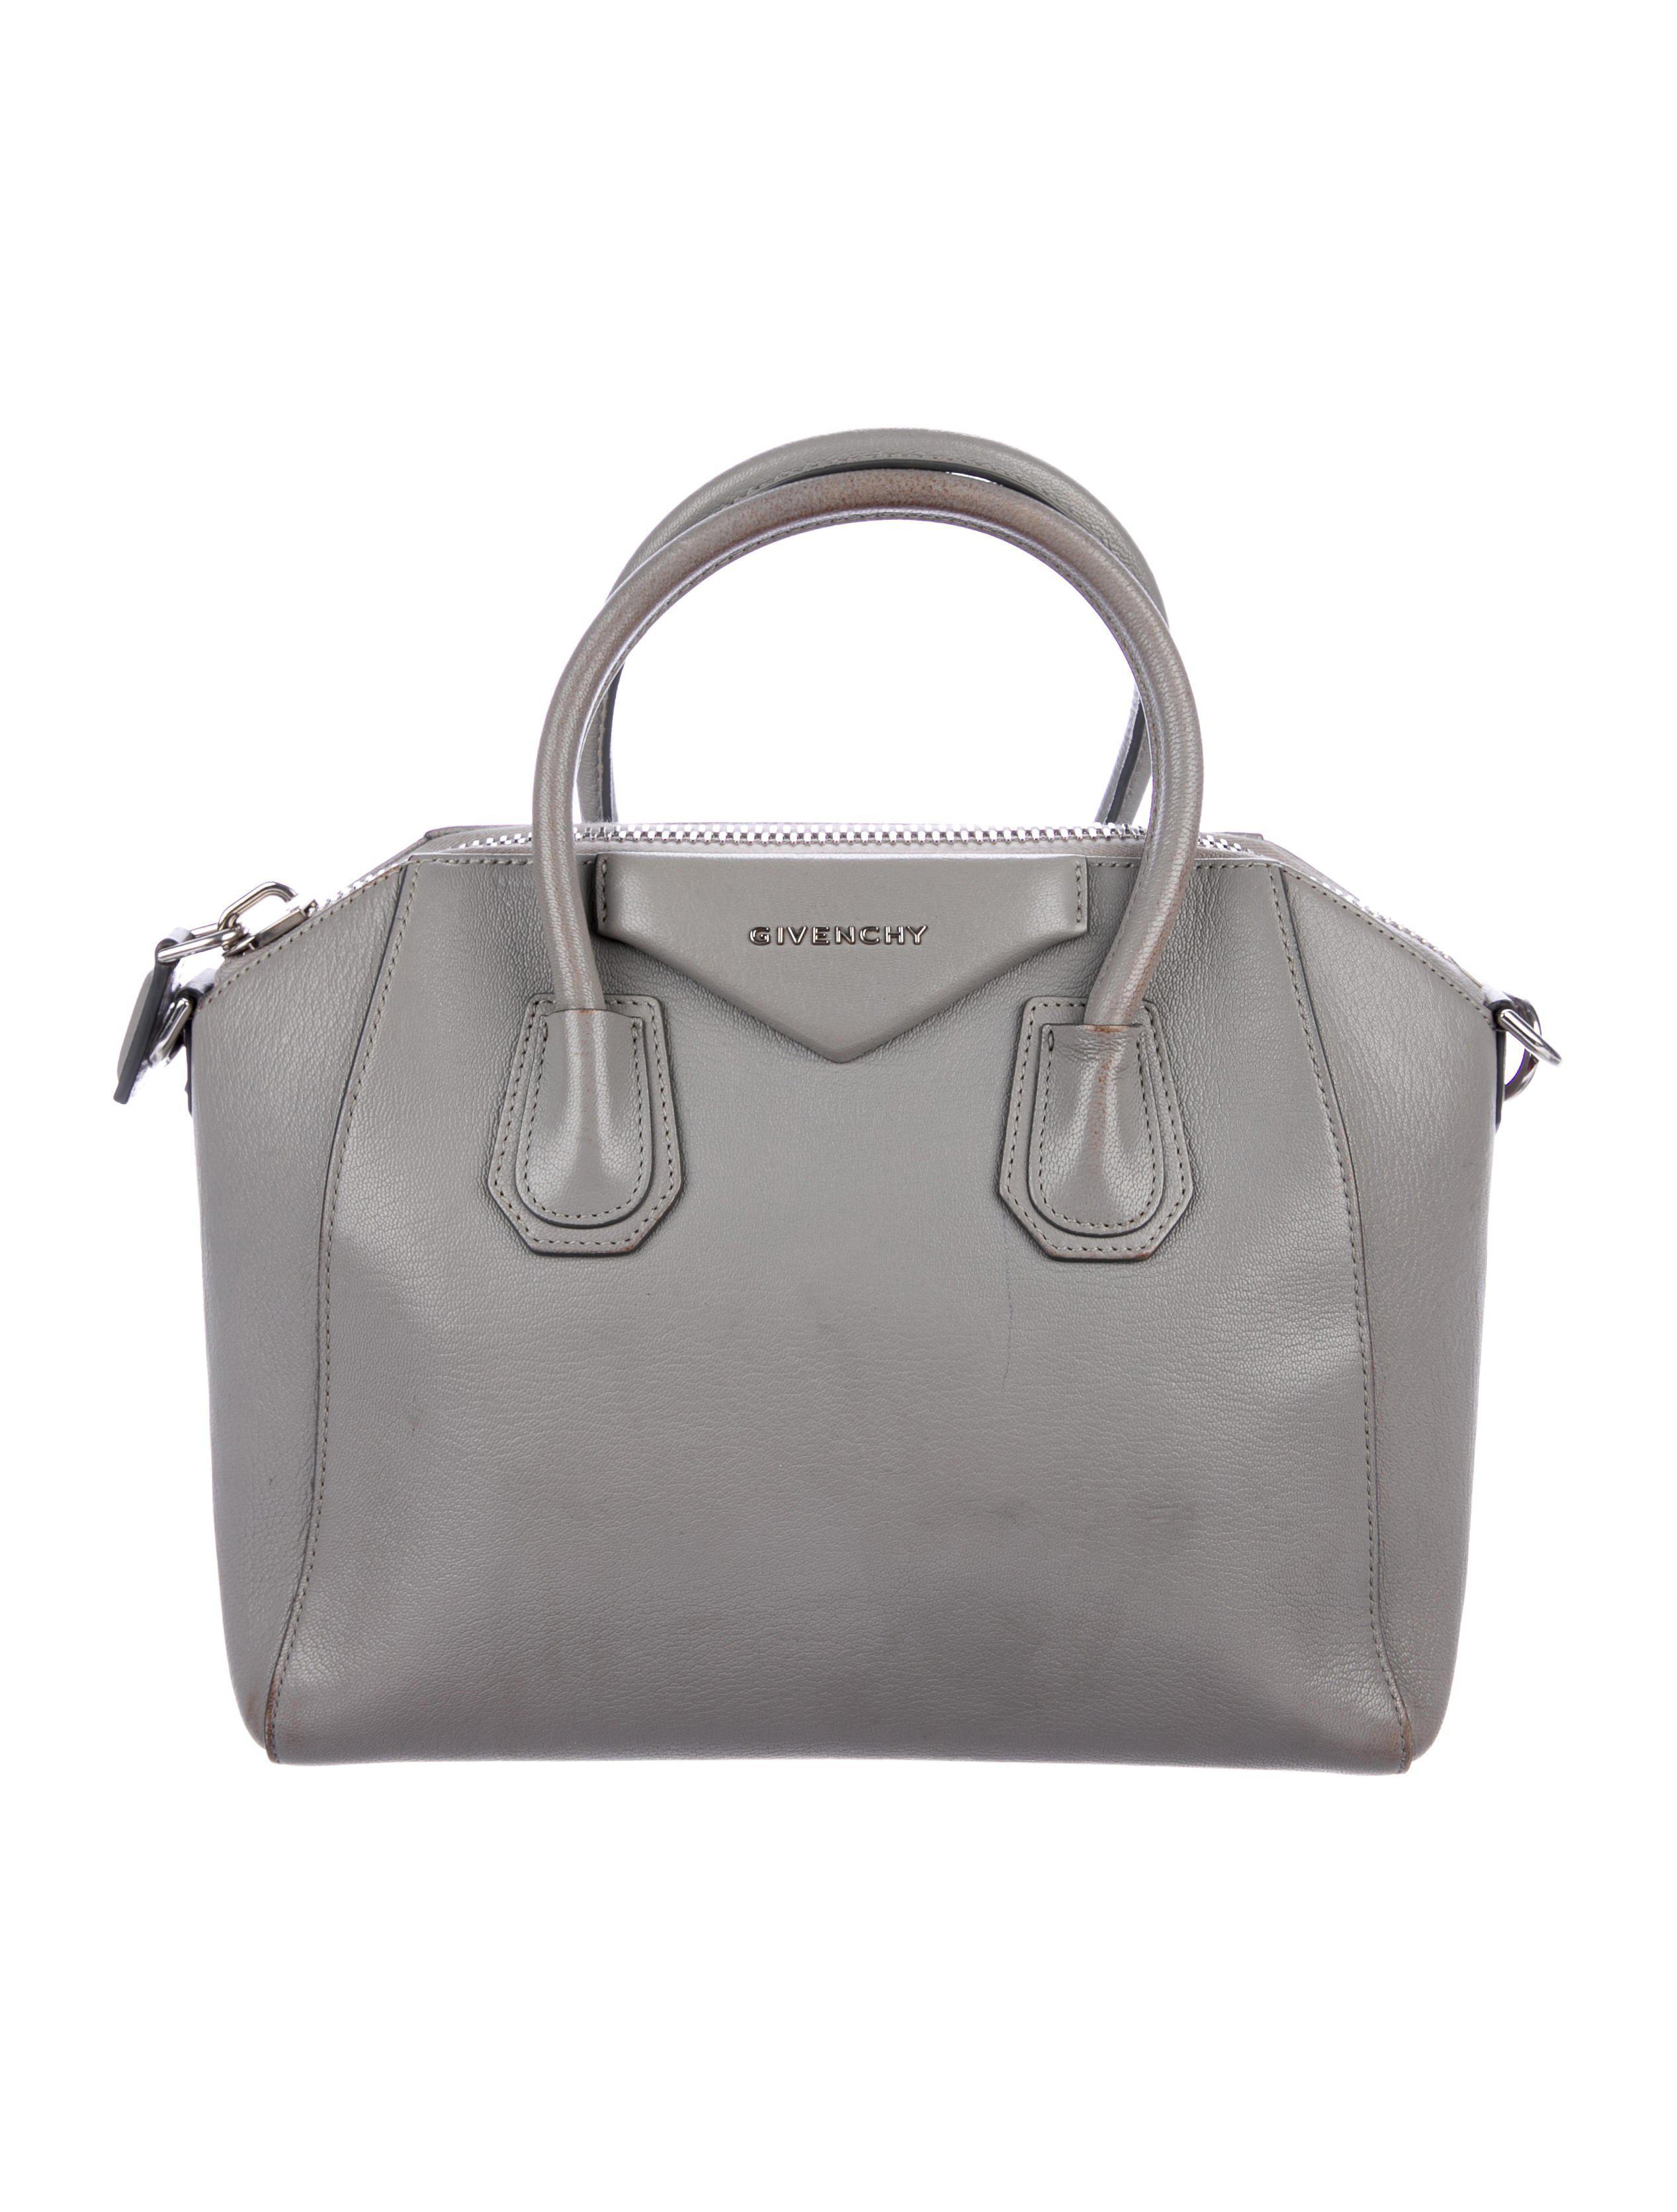 Givenchy - Metallic Small Antigona Bag Grey - Lyst. View fullscreen 7081dc899b056